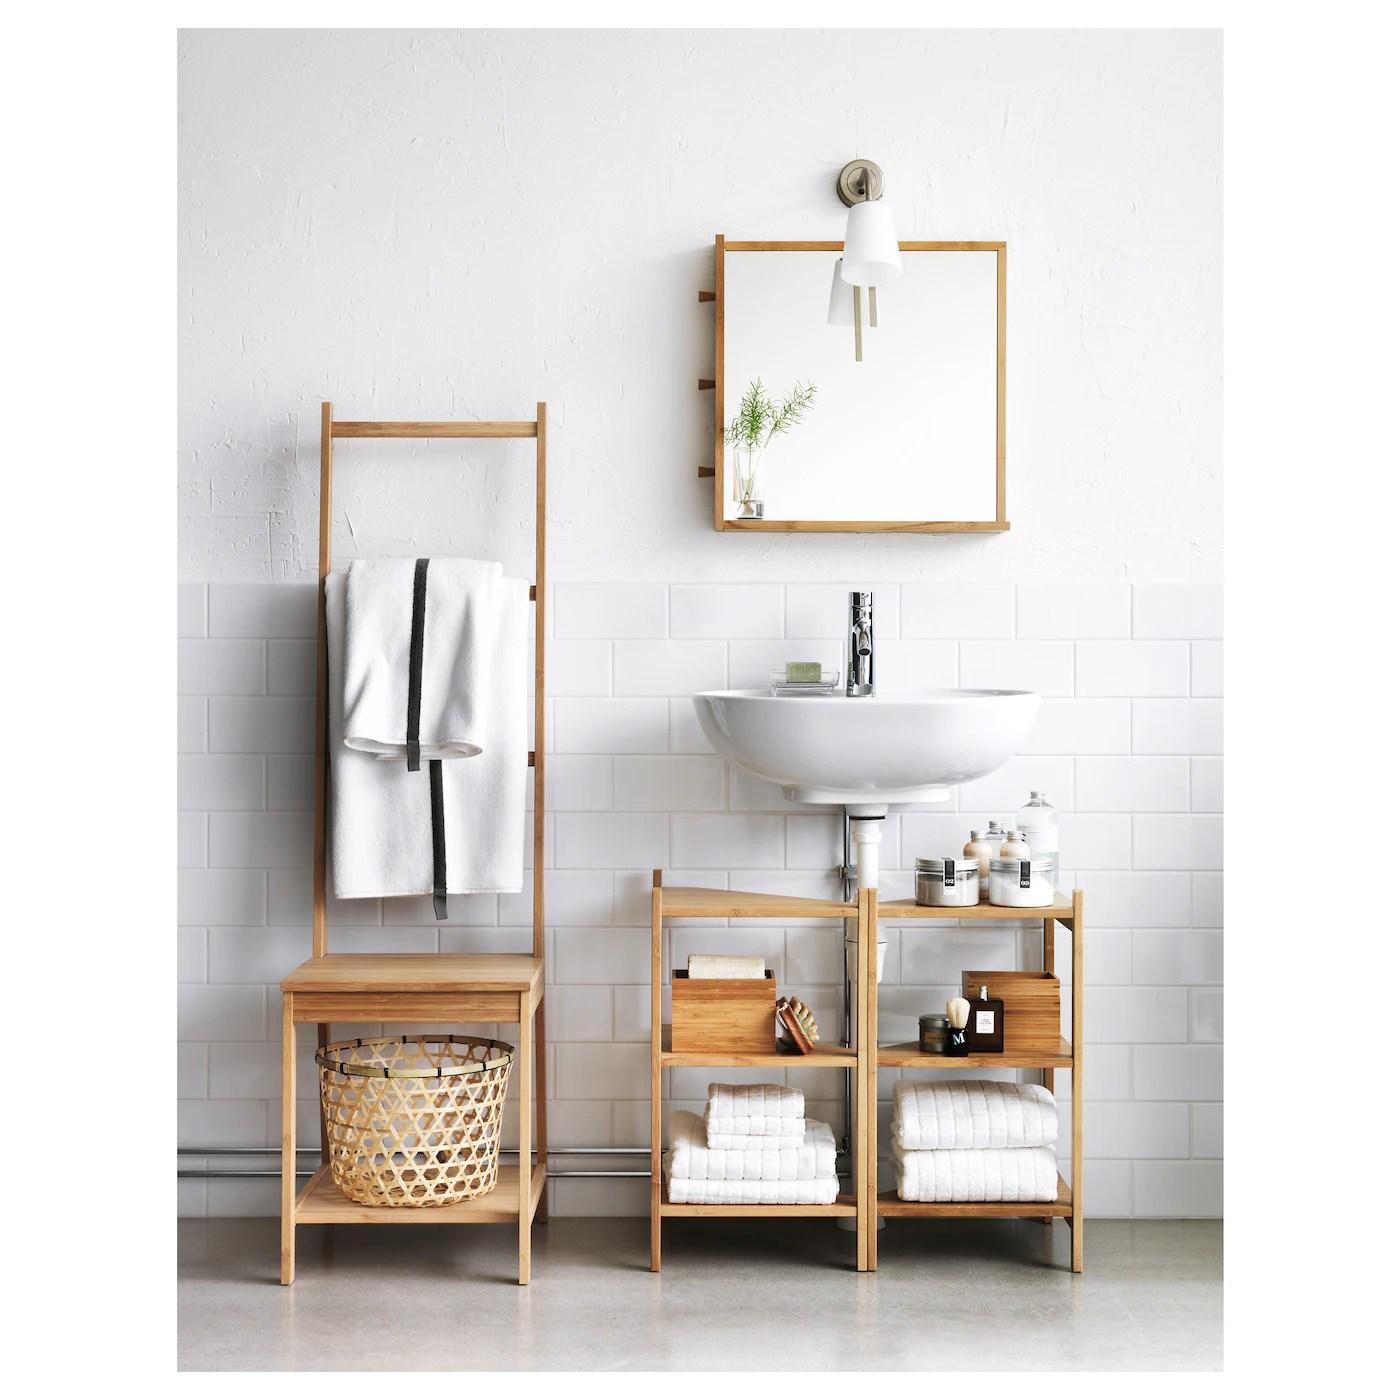 ragrund etagere sous lavabo d angle bambou 13 3 8x23 5 8 34x60 cm